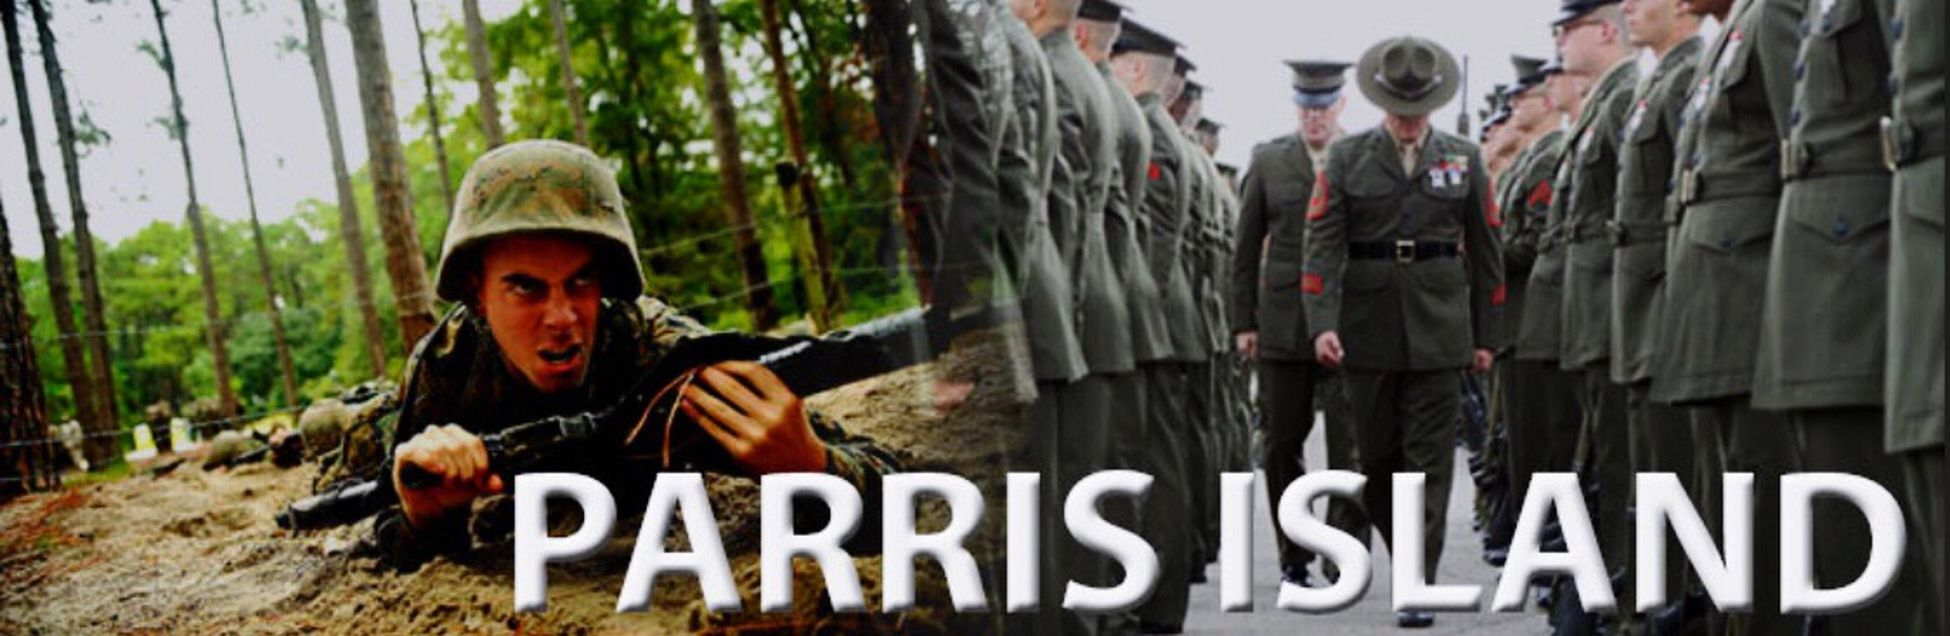 U.S Marine Corps Recruit Depo Parris Island USA Us Military USMC Parris Island